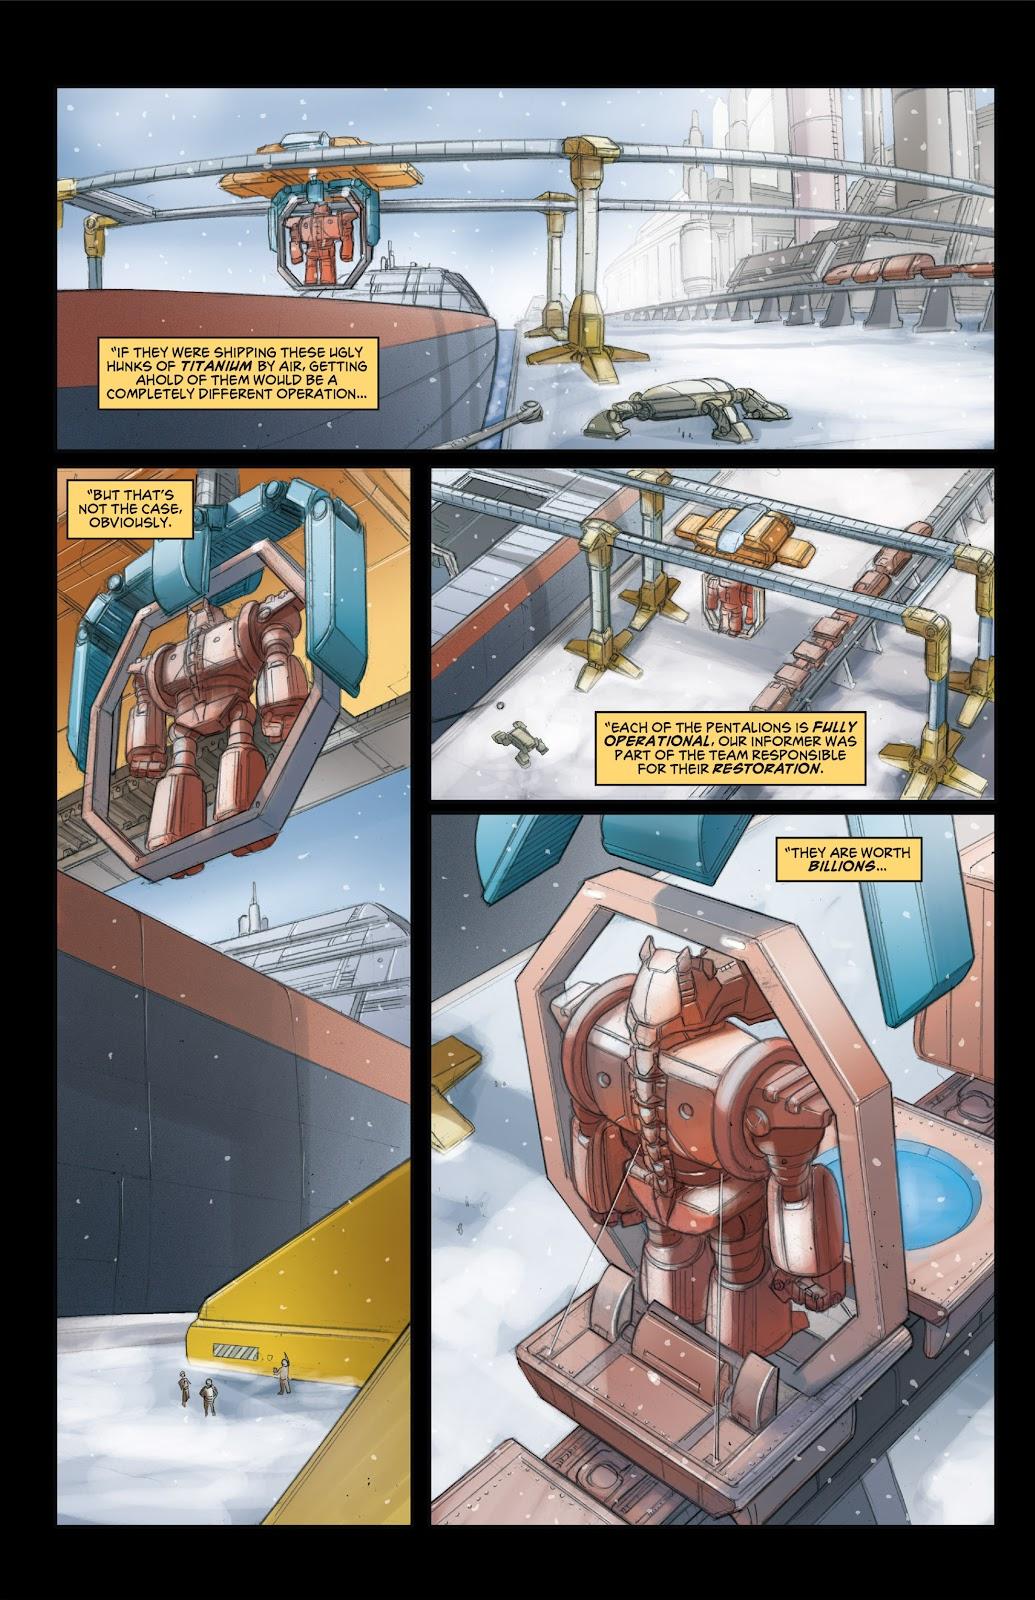 Read online Elephantmen 2261 Season Two: The Pentalion Job comic -  Issue # TPB - 25